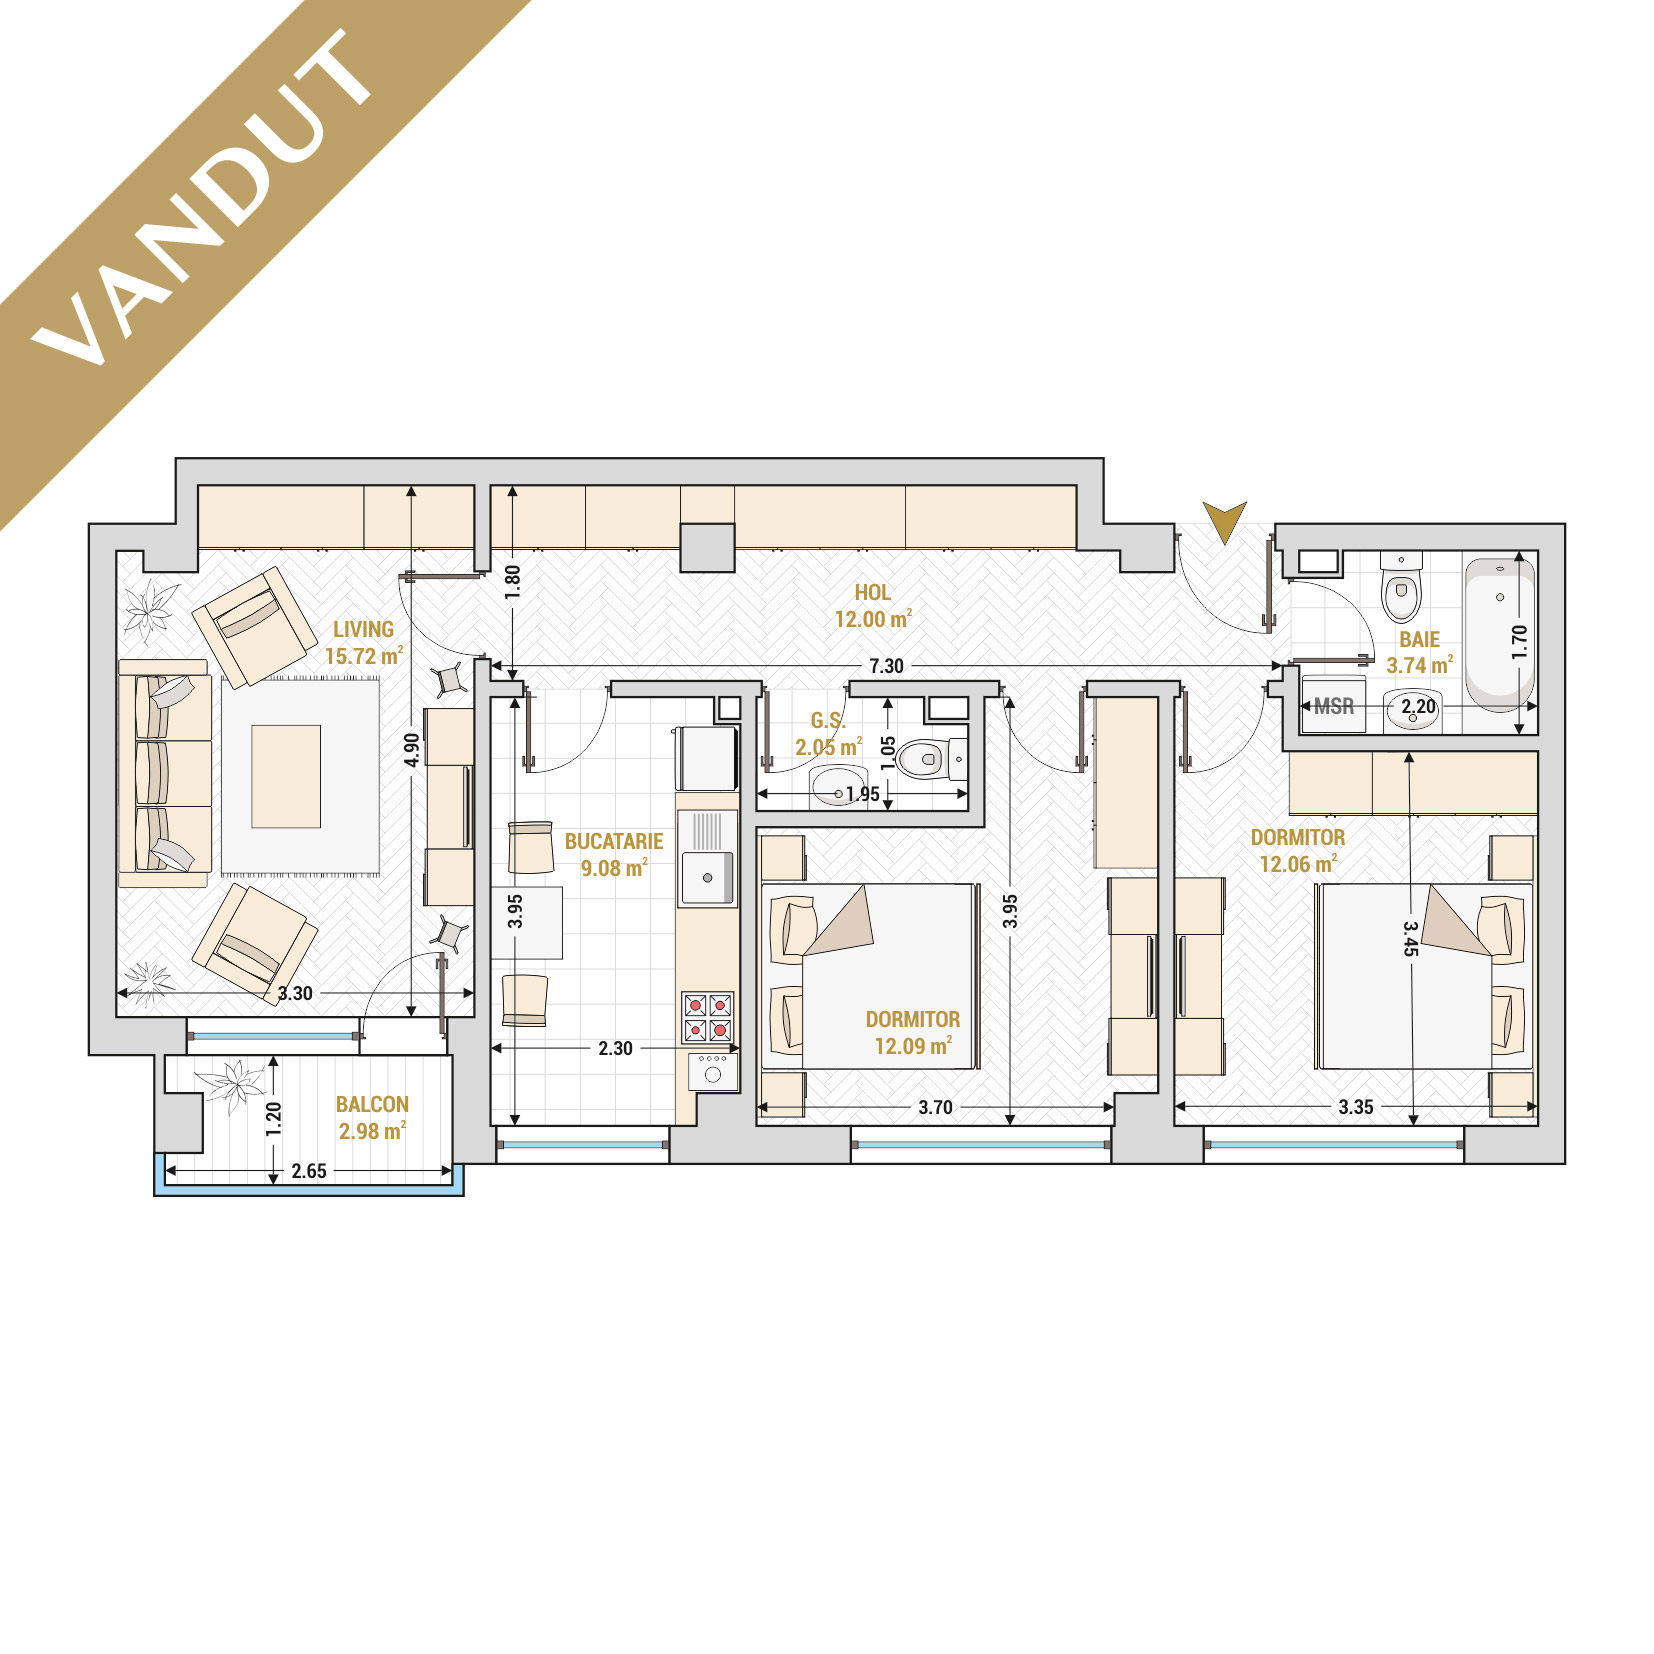 Apartament 3 camere de vanzare Bucuresti - Catedral Residence - Marriott, Piata Unirii, 13 Septembrie, Izvor - Tip 2 - T2 - V